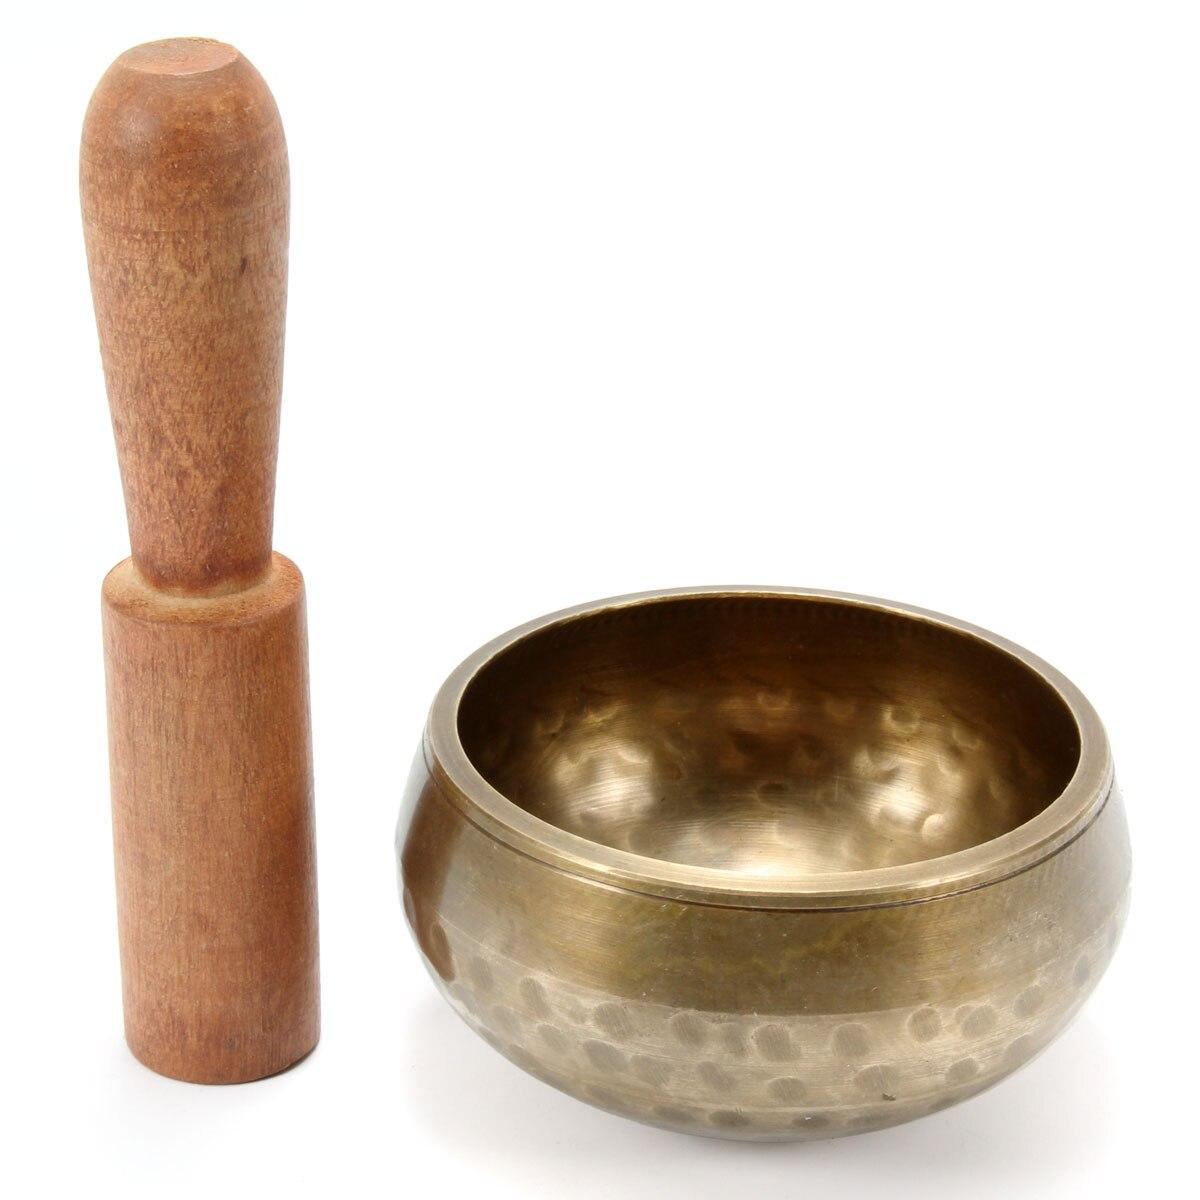 Buddhism Brass Yoga Tibetan Singing Bowl with Wooden Hand Hammered Chakra Buddhist Meditation Gift Home Decor Ornaments|Bowls & Plates| |  - title=